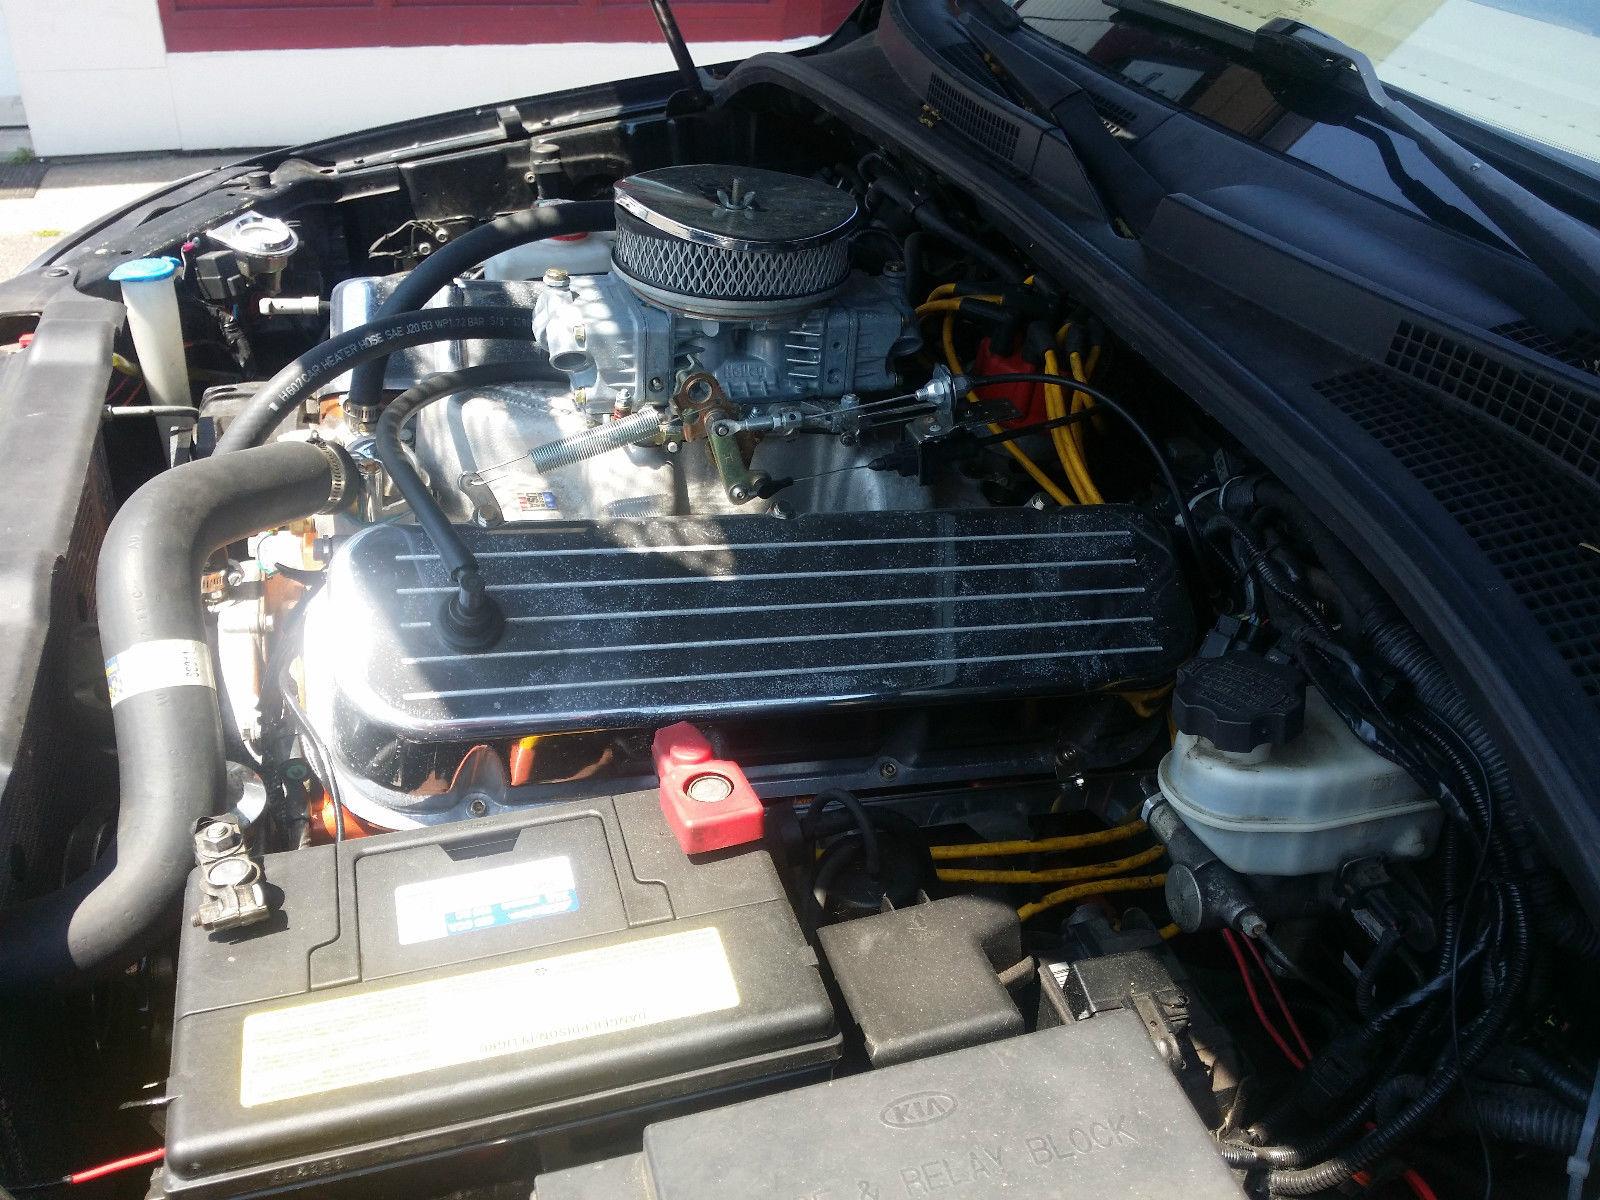 Weirdest Engine Swap Ever Kia Sorento With Chevy Big Block V Photo Gallery on 15 Kia Sorento